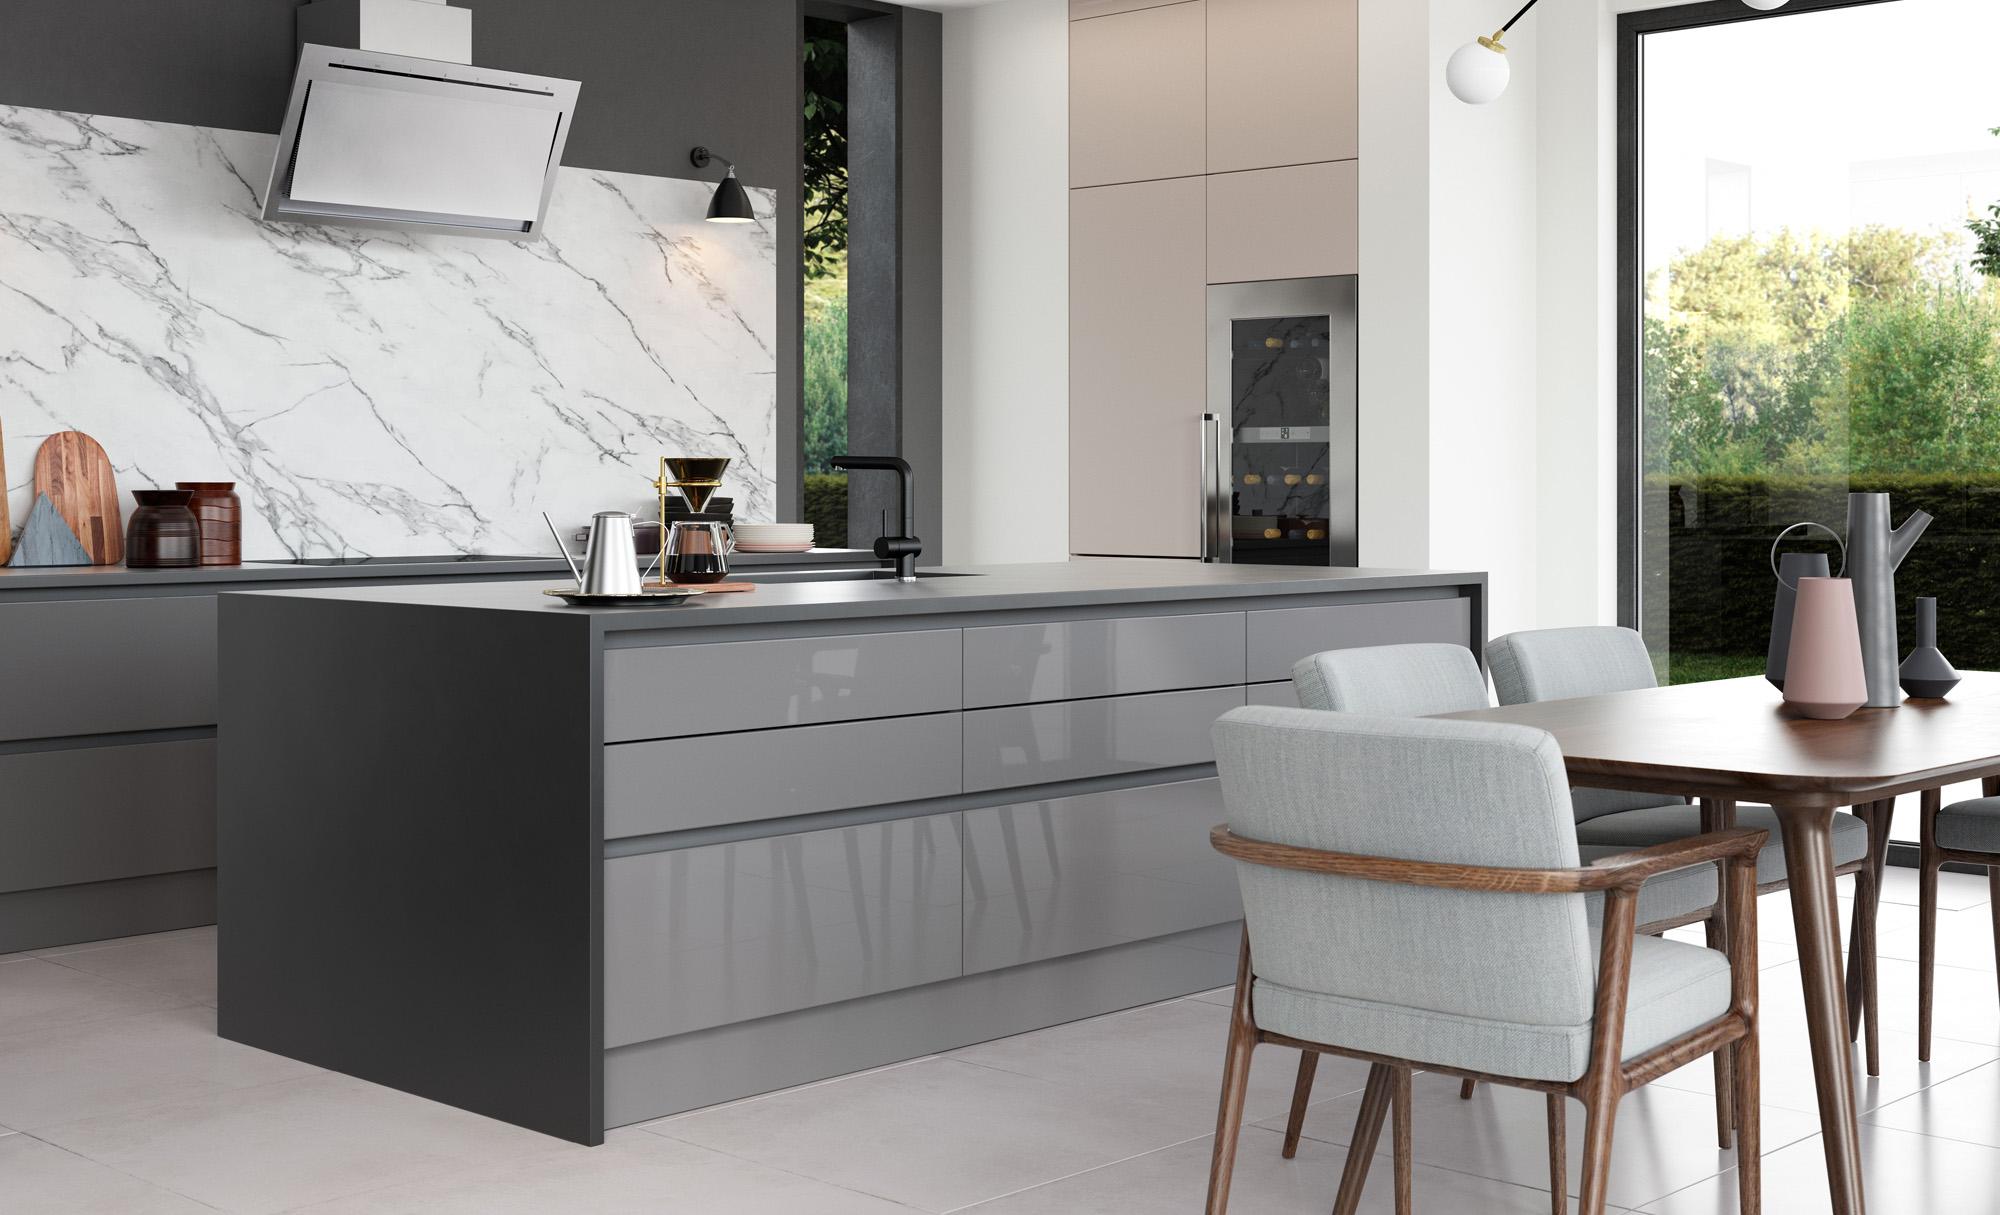 Modern Contemporary Kitchen - Zola Gloss Dust Grey Cashmere, Tavola Stained Anthracite Kitchen - Kitchen Design - Alan Kelly Kitchens - Waterford